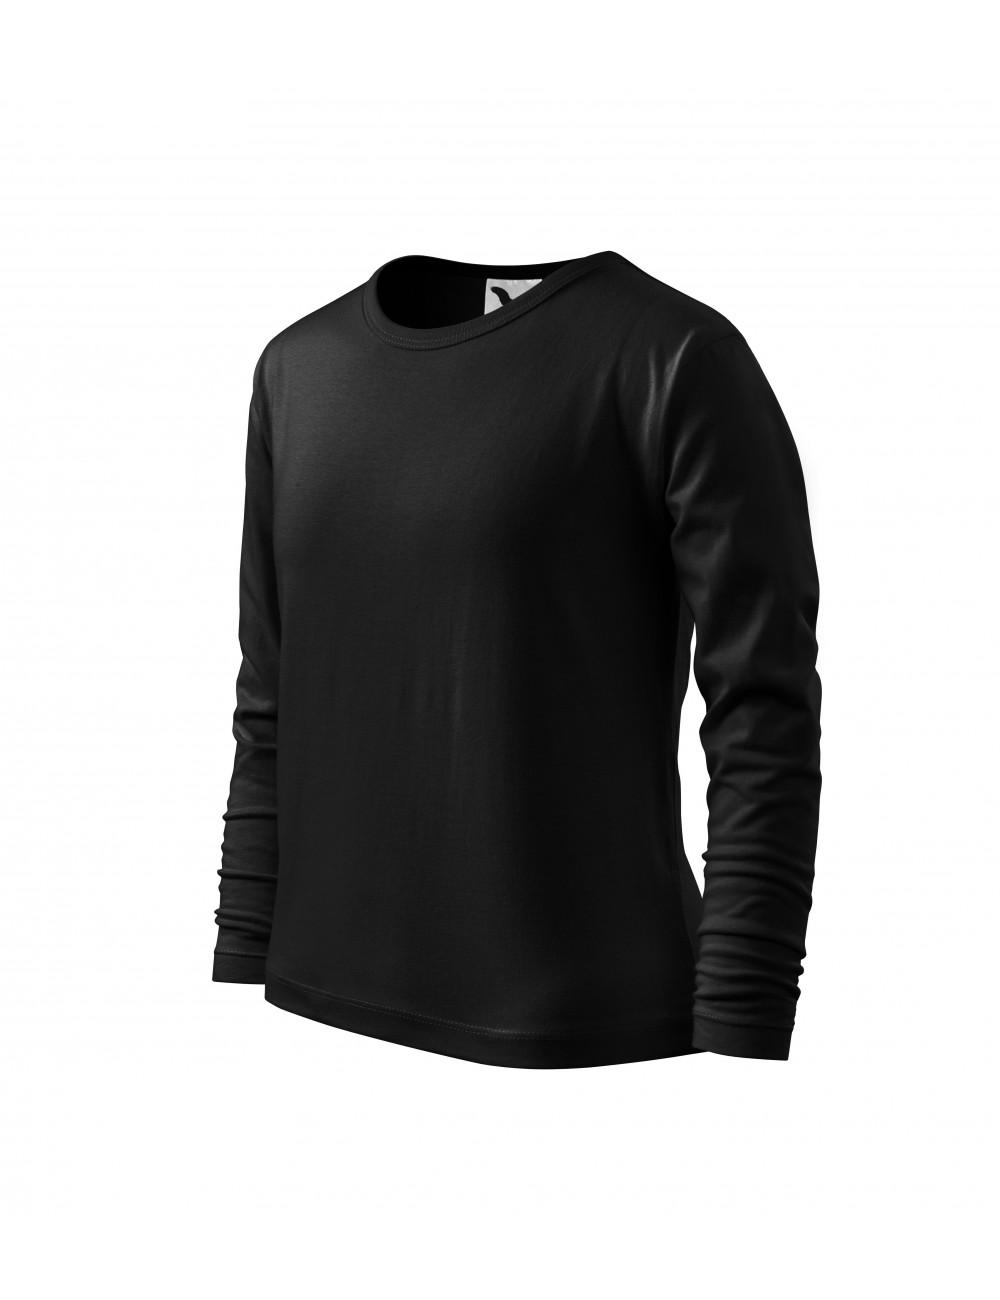 Adler MALFINI Koszulka dziecięca Long Sleeve 121 czarny